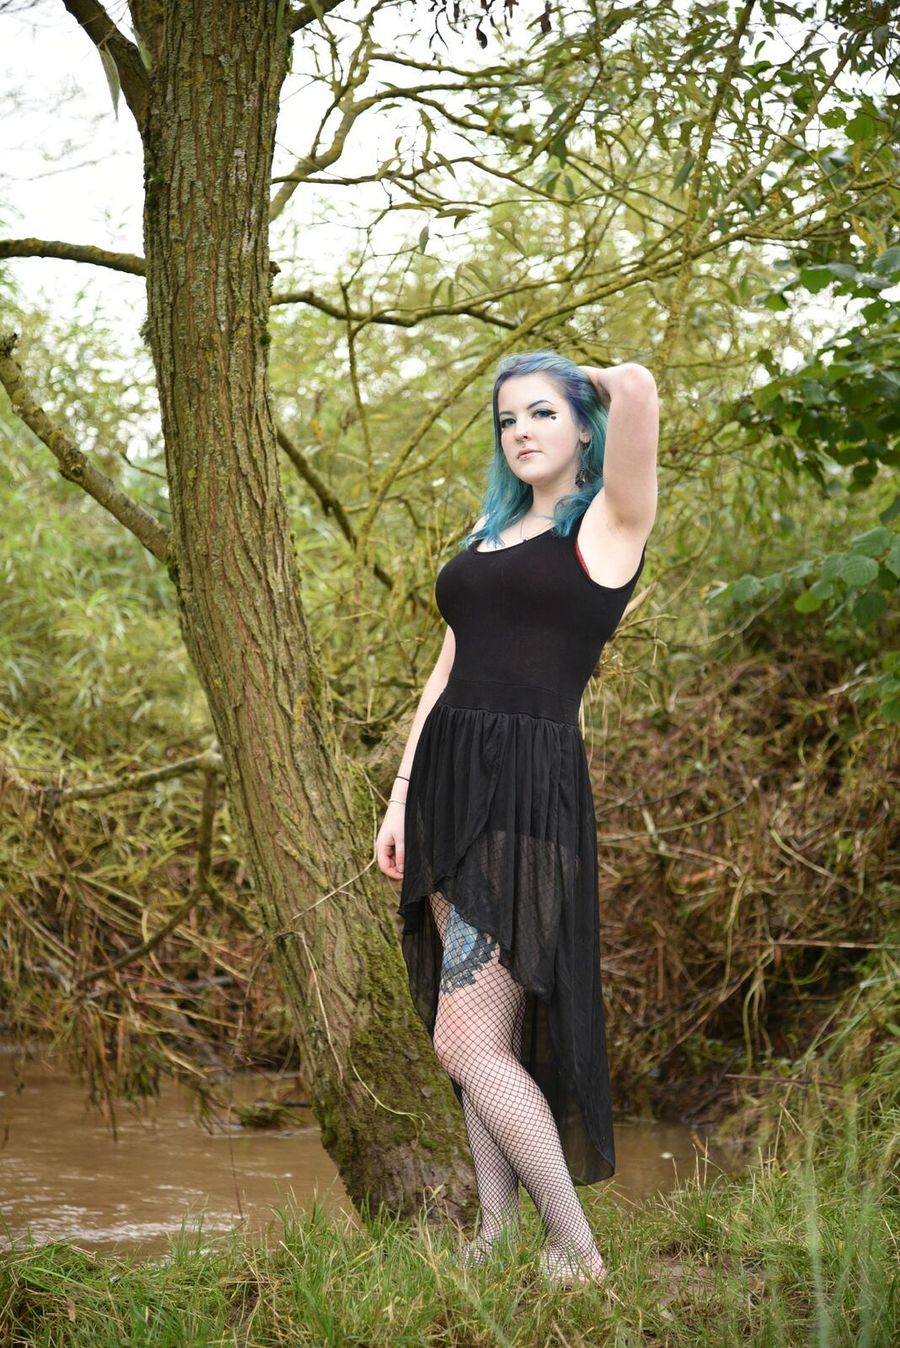 Photography by Jono Purday, Model Beckybb / Uploaded 13th November 2019 @ 11:33 PM